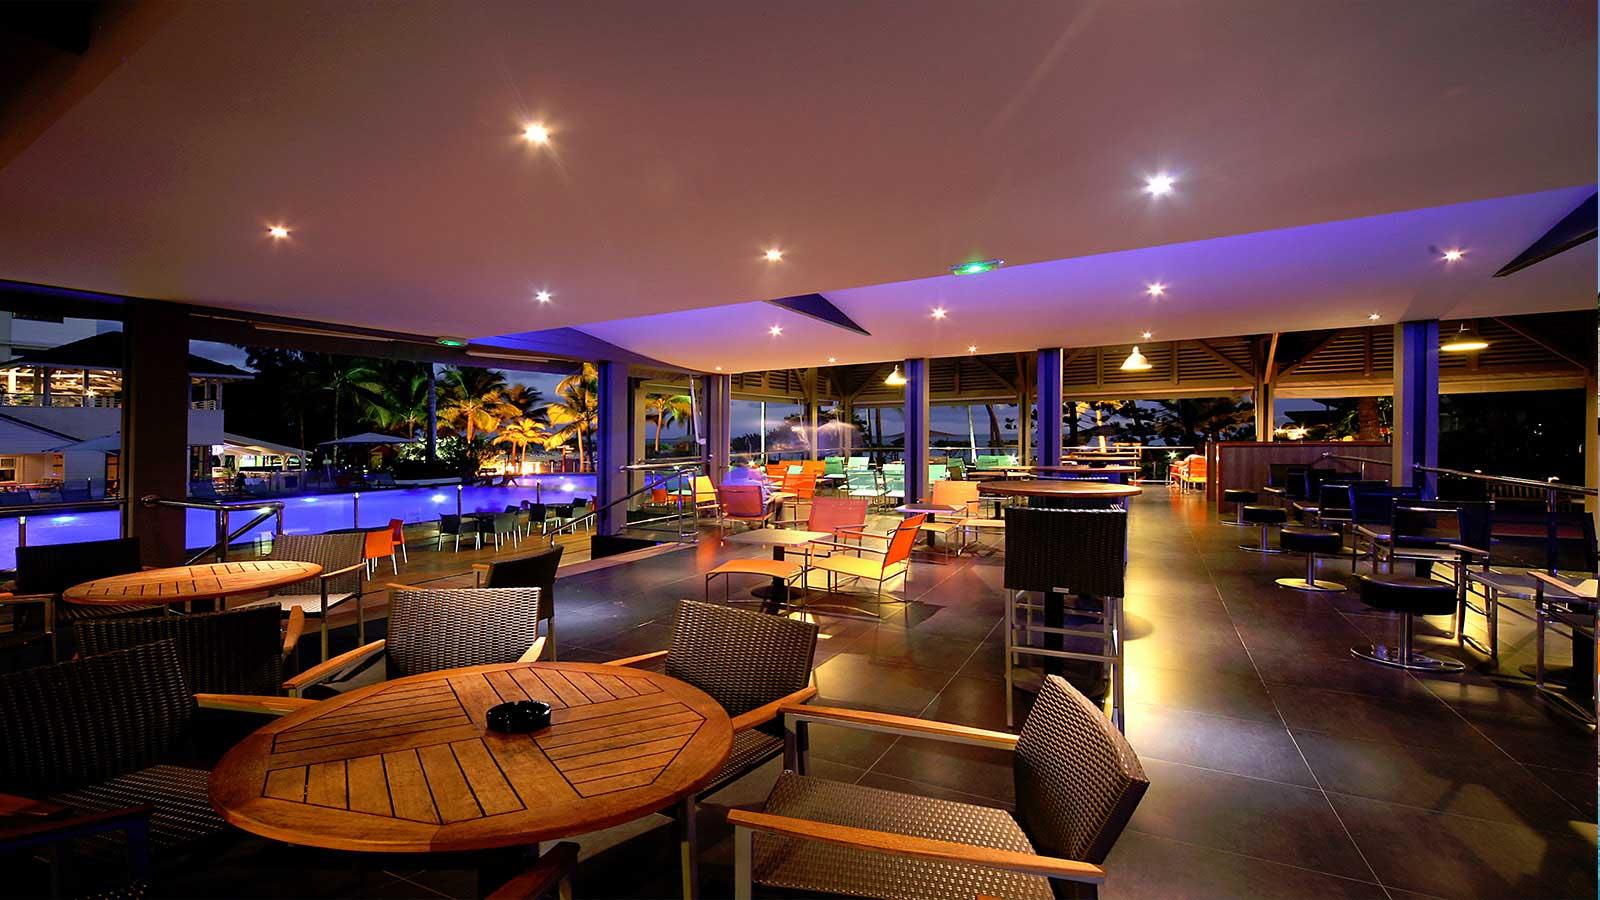 http://www.deshotelsetdesiles.com/hotel-vol-guadeloupe/photos/fond-creole-3.jpg